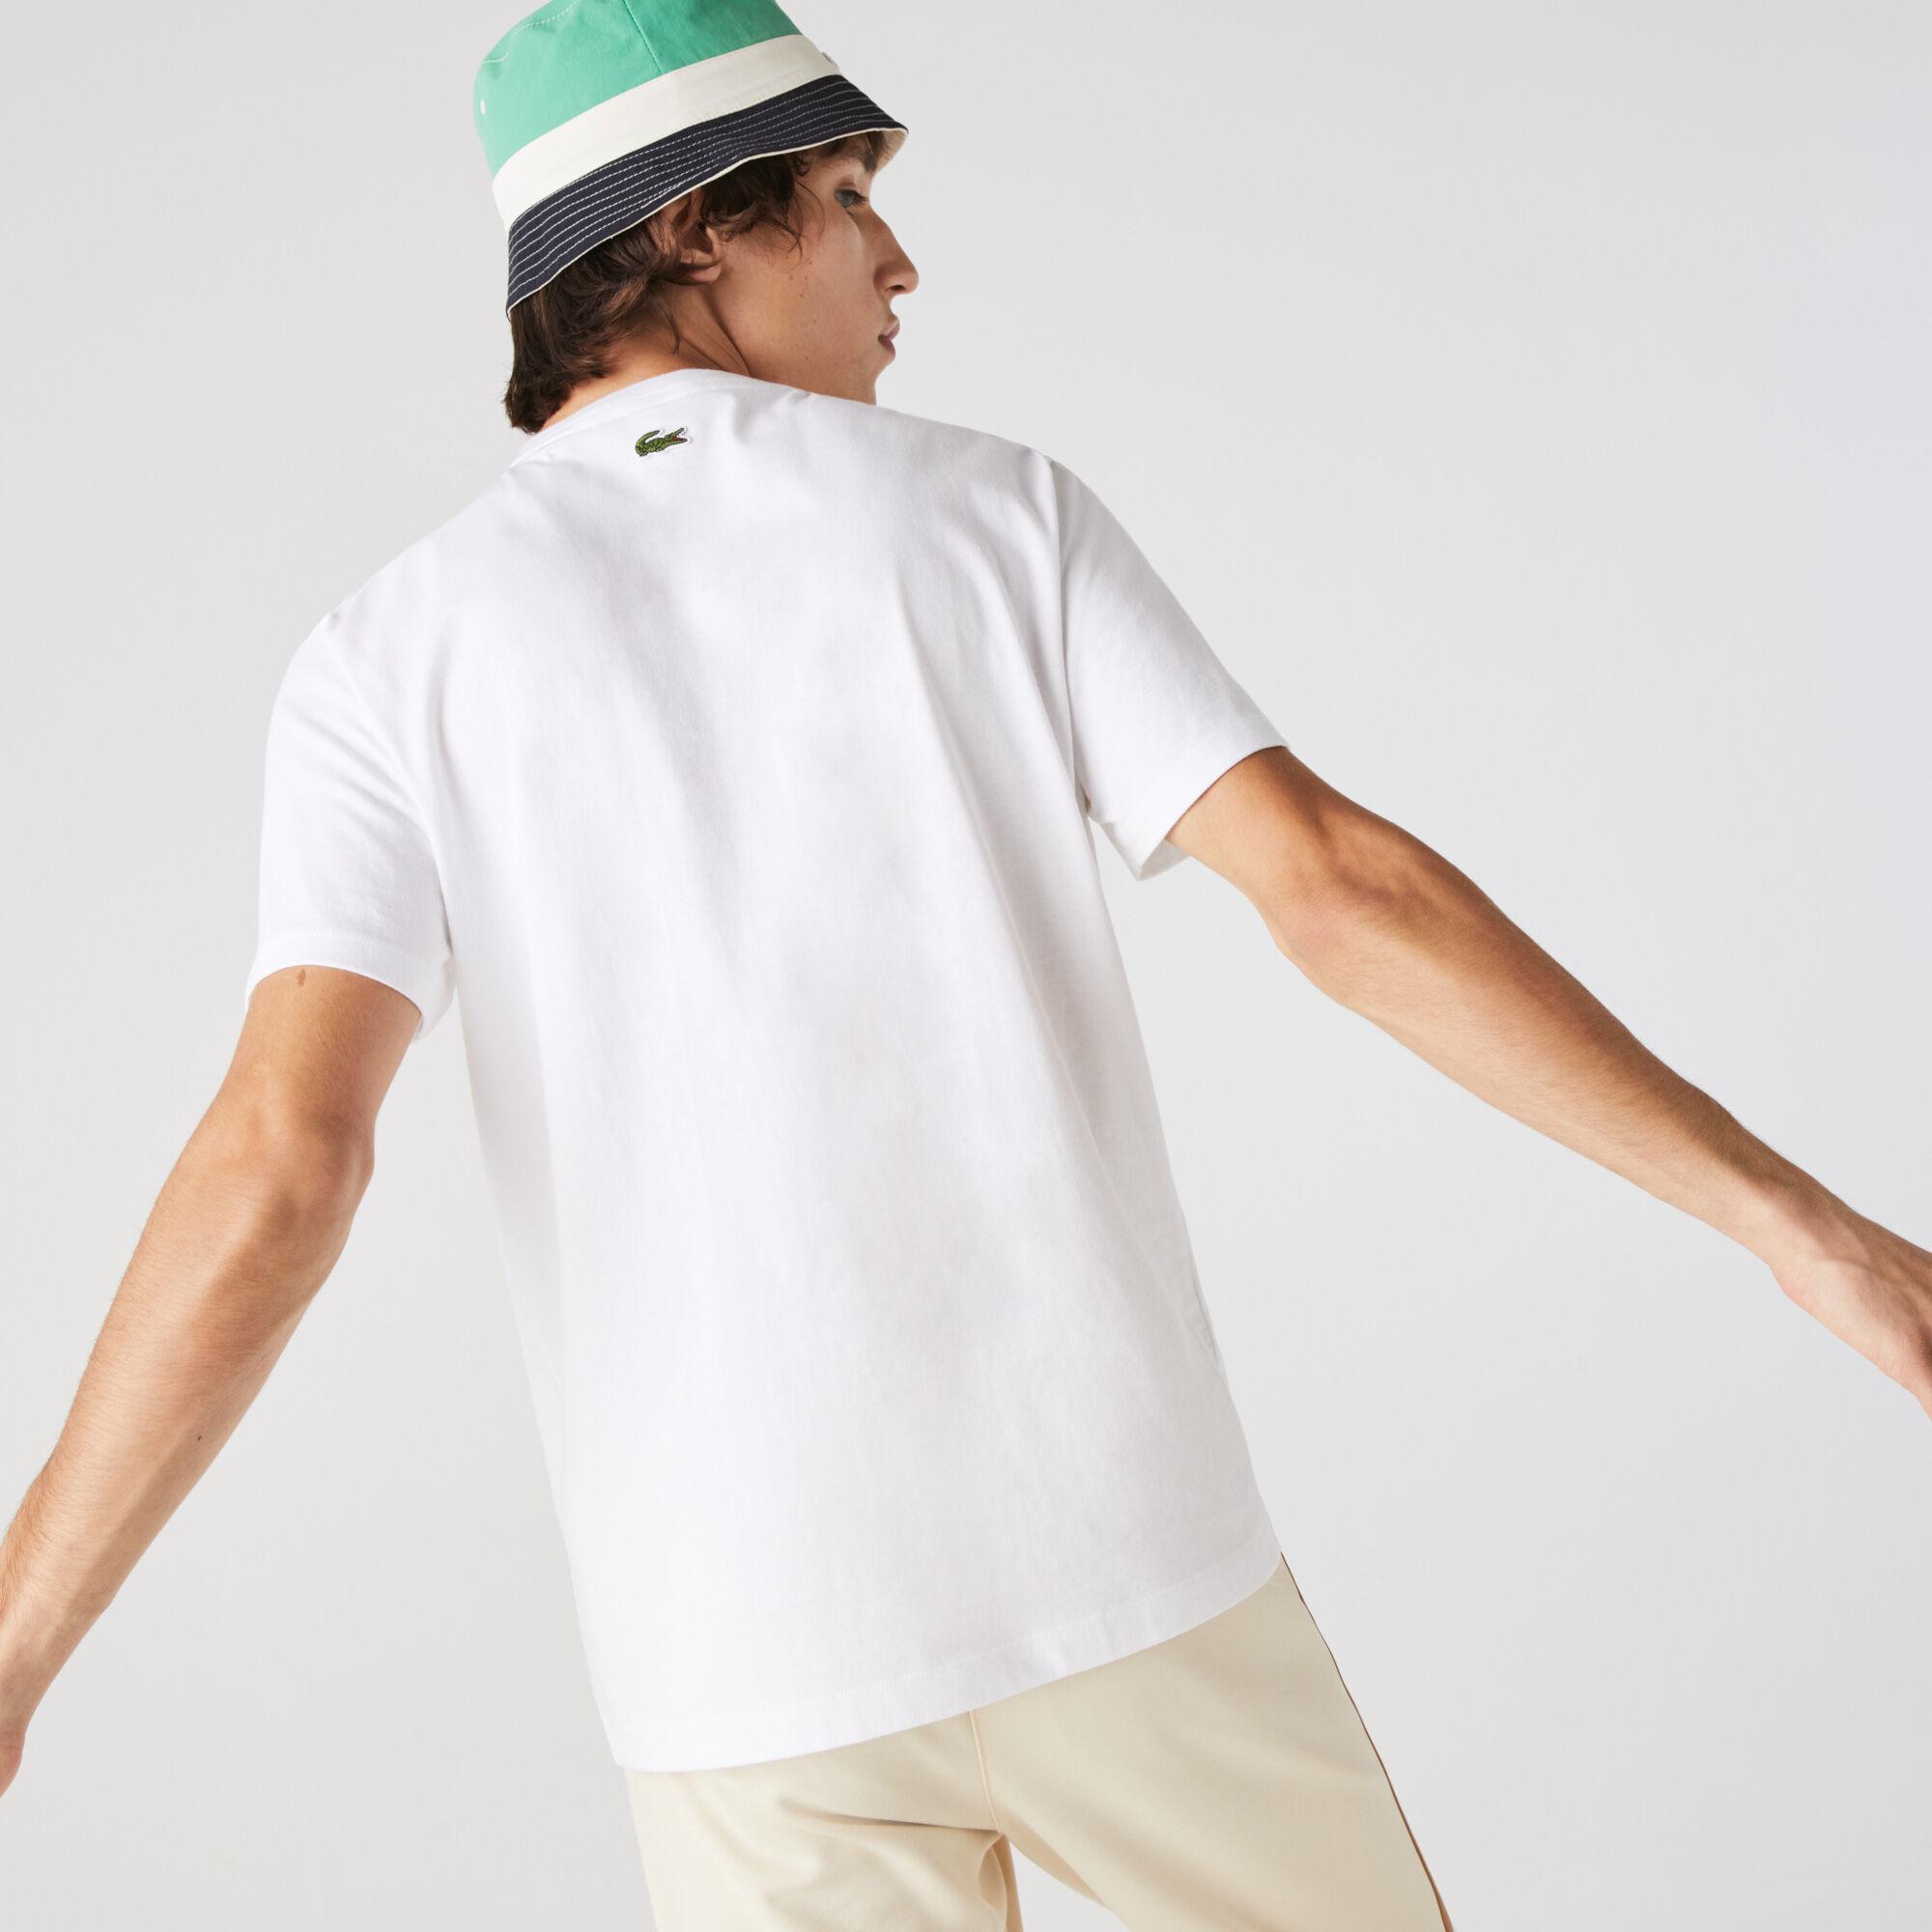 Men's Crew Neck Crocodile Embroidery Cotton T-shirt